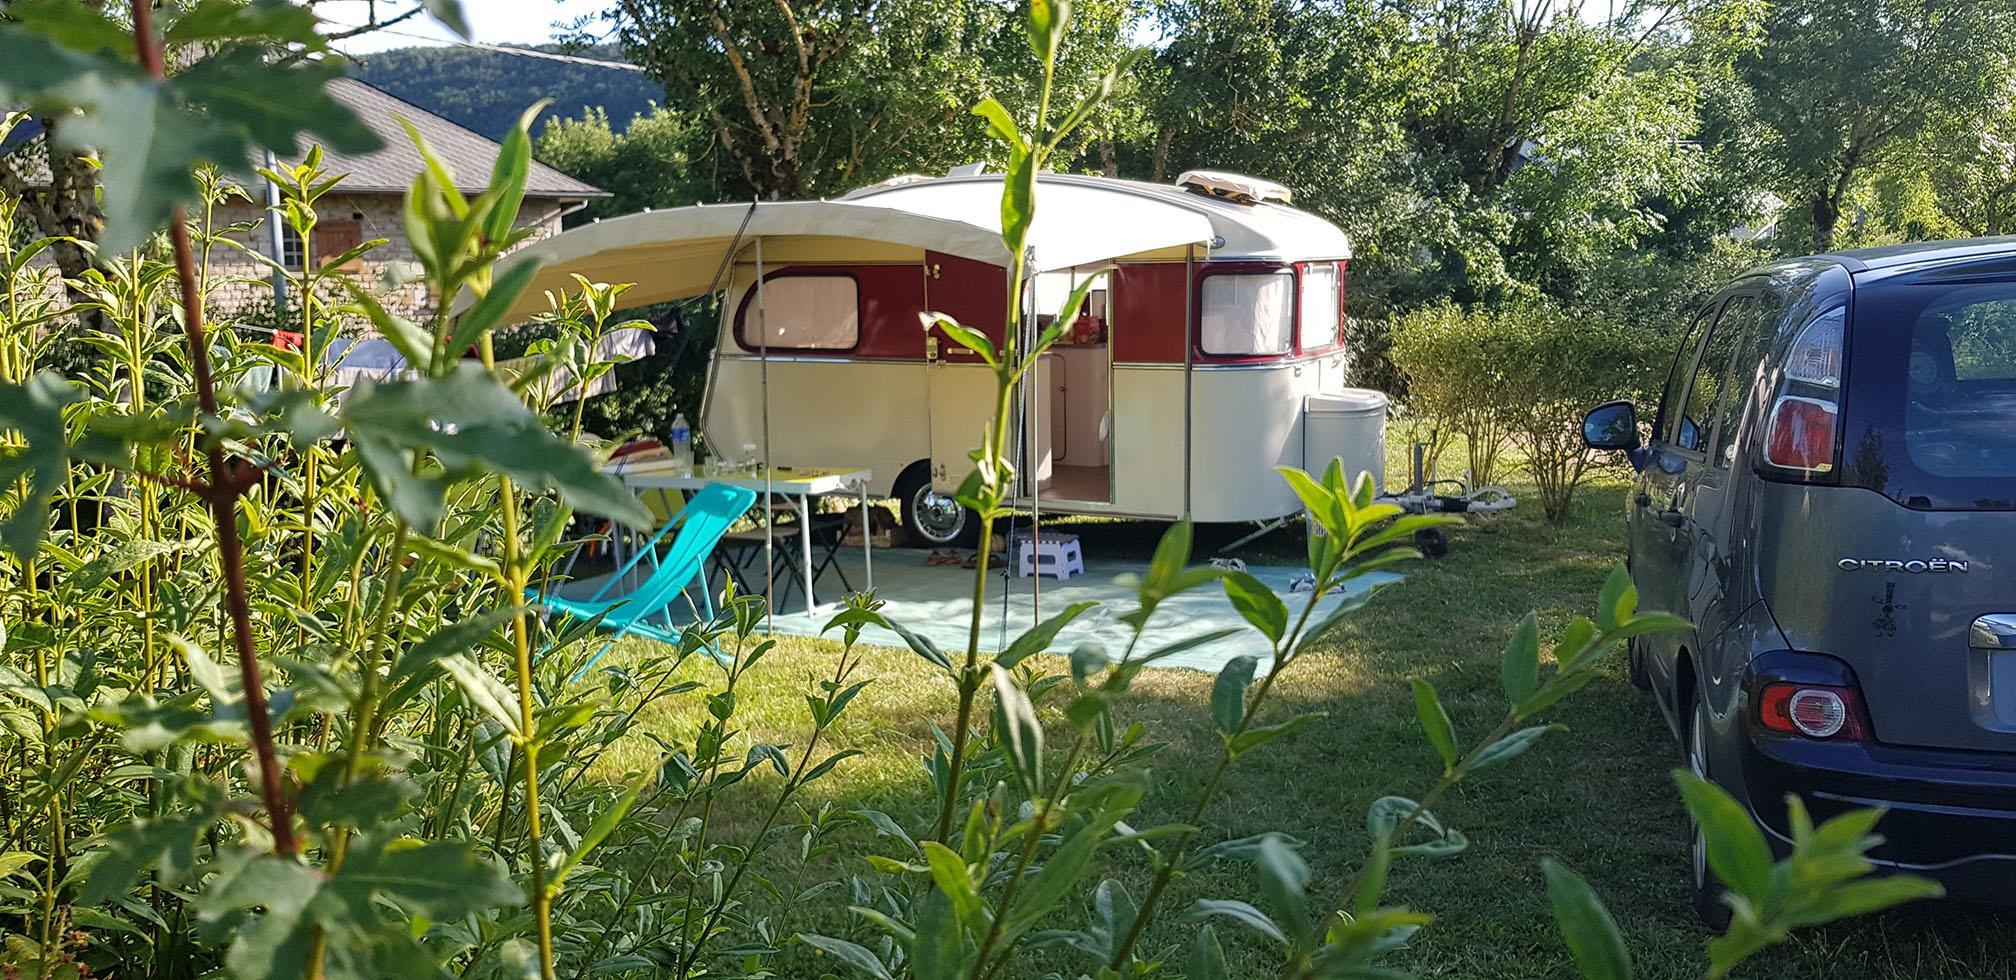 Camping les Calquières, Sévérac-d'Aveyron, Aveyron